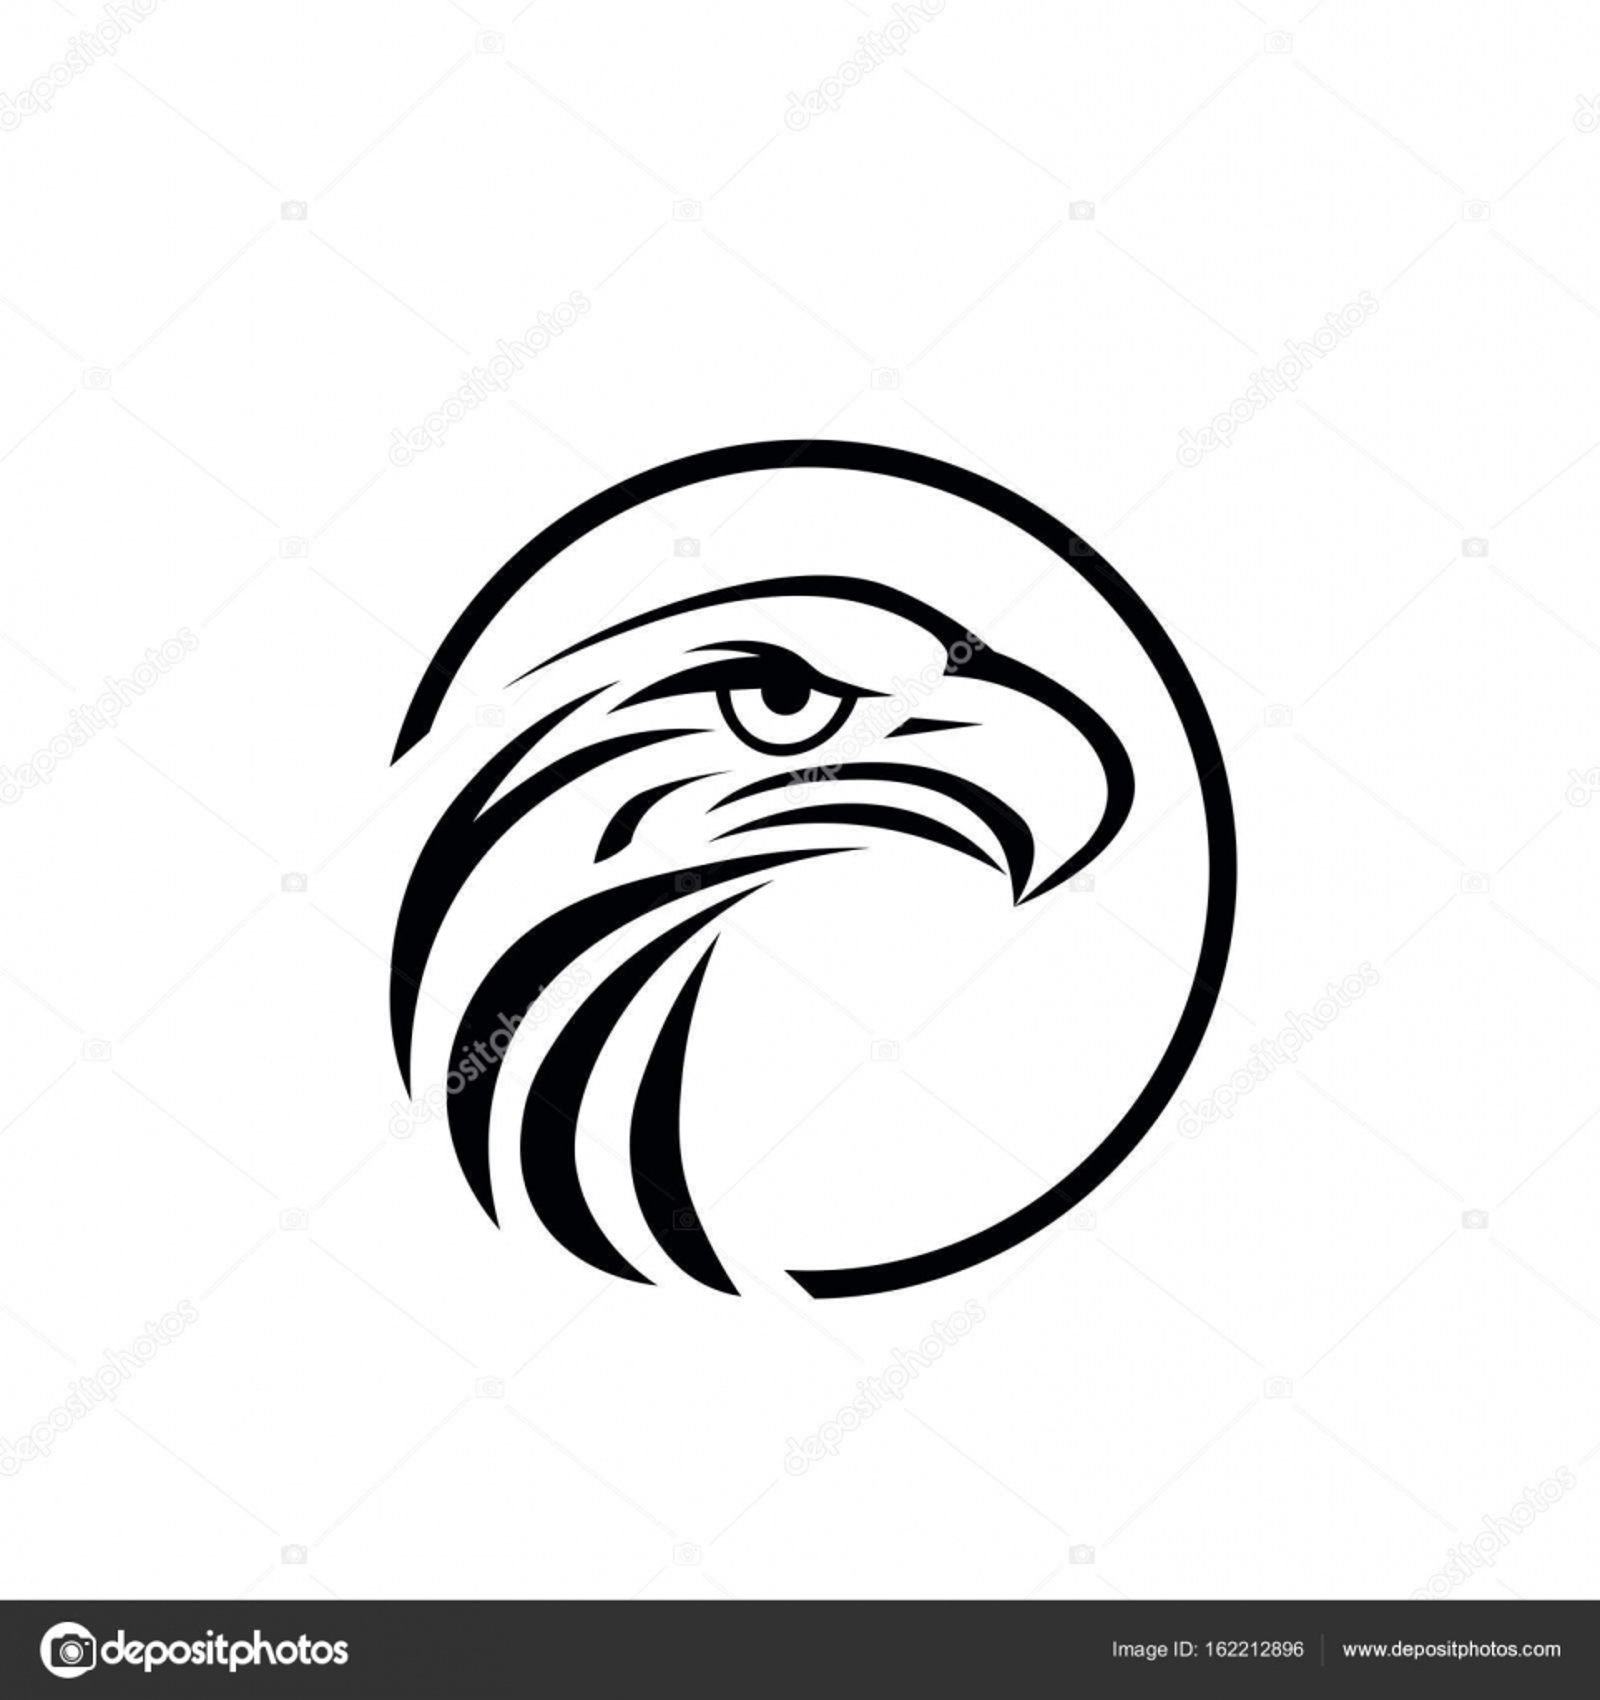 Eagle vector logo template stock vector dikiykachap1 162212896 eagle icon symbol of eagle hawk predator for sport team mascot company badge guard service hunting club label vector by dikiykachap1 biocorpaavc Images